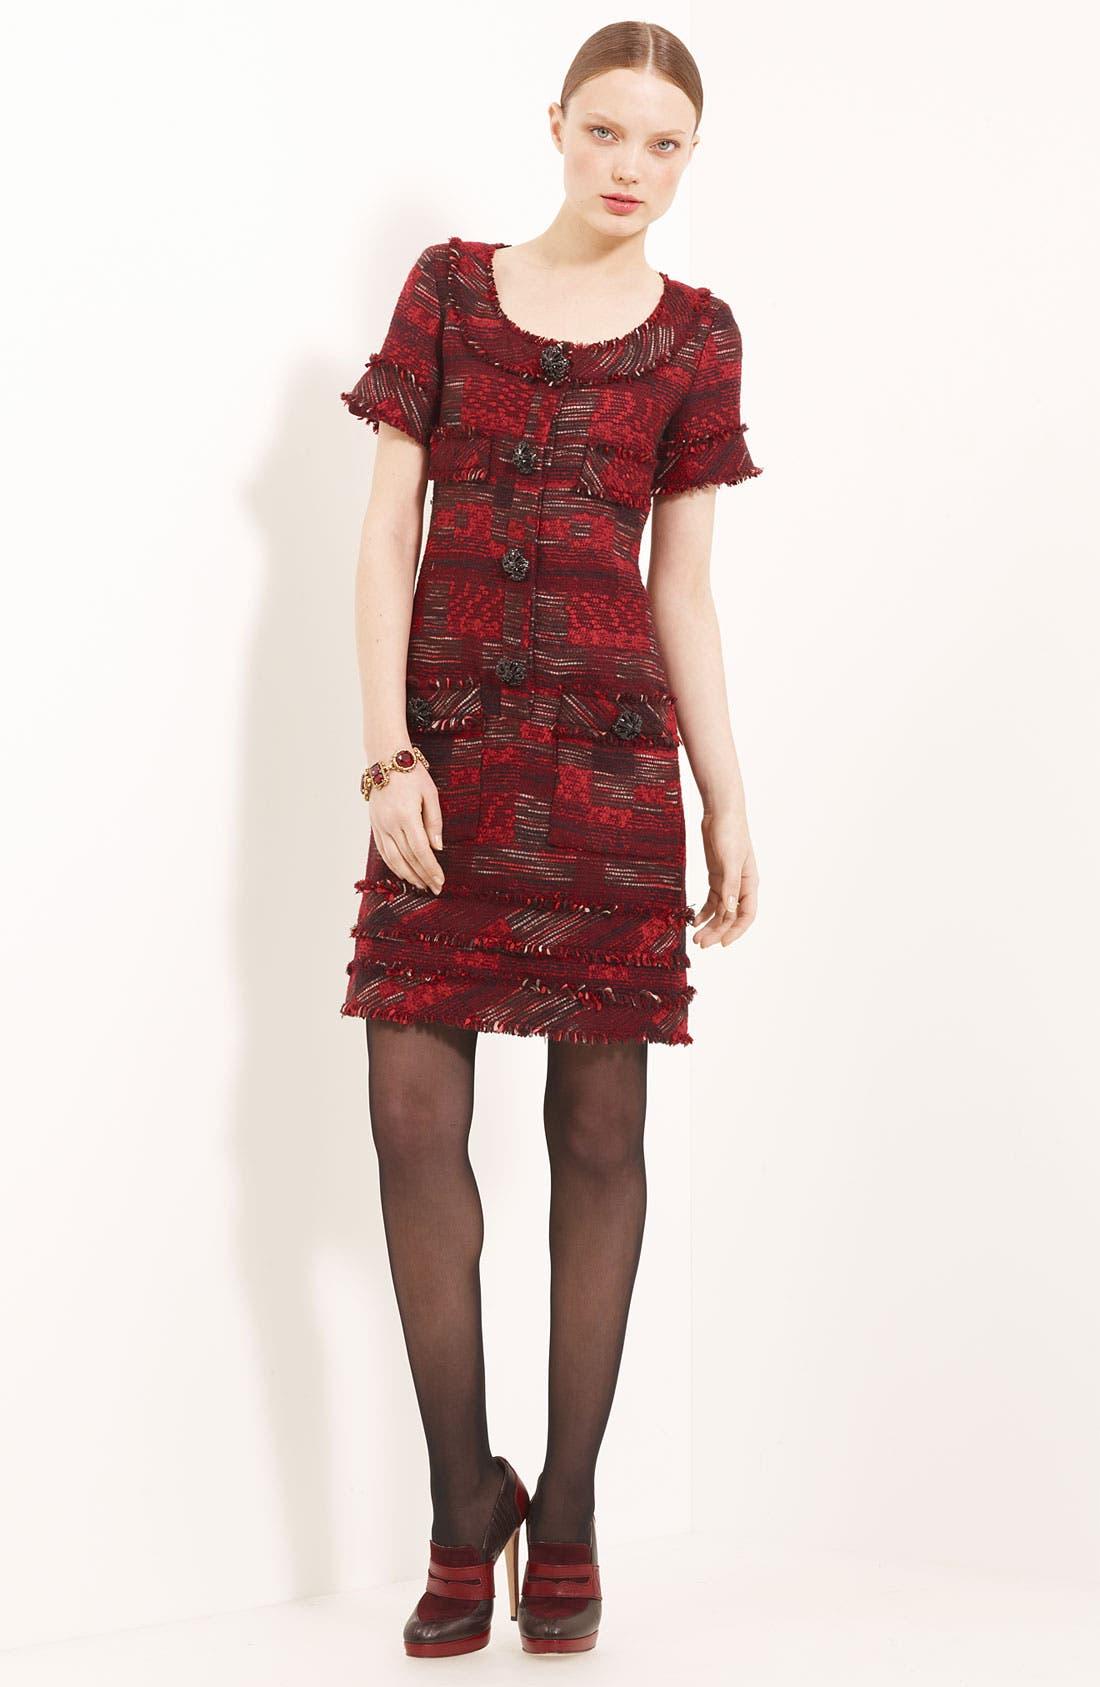 Alternate Image 1 Selected - Oscar de la Renta Mixed Media Tweed Dress